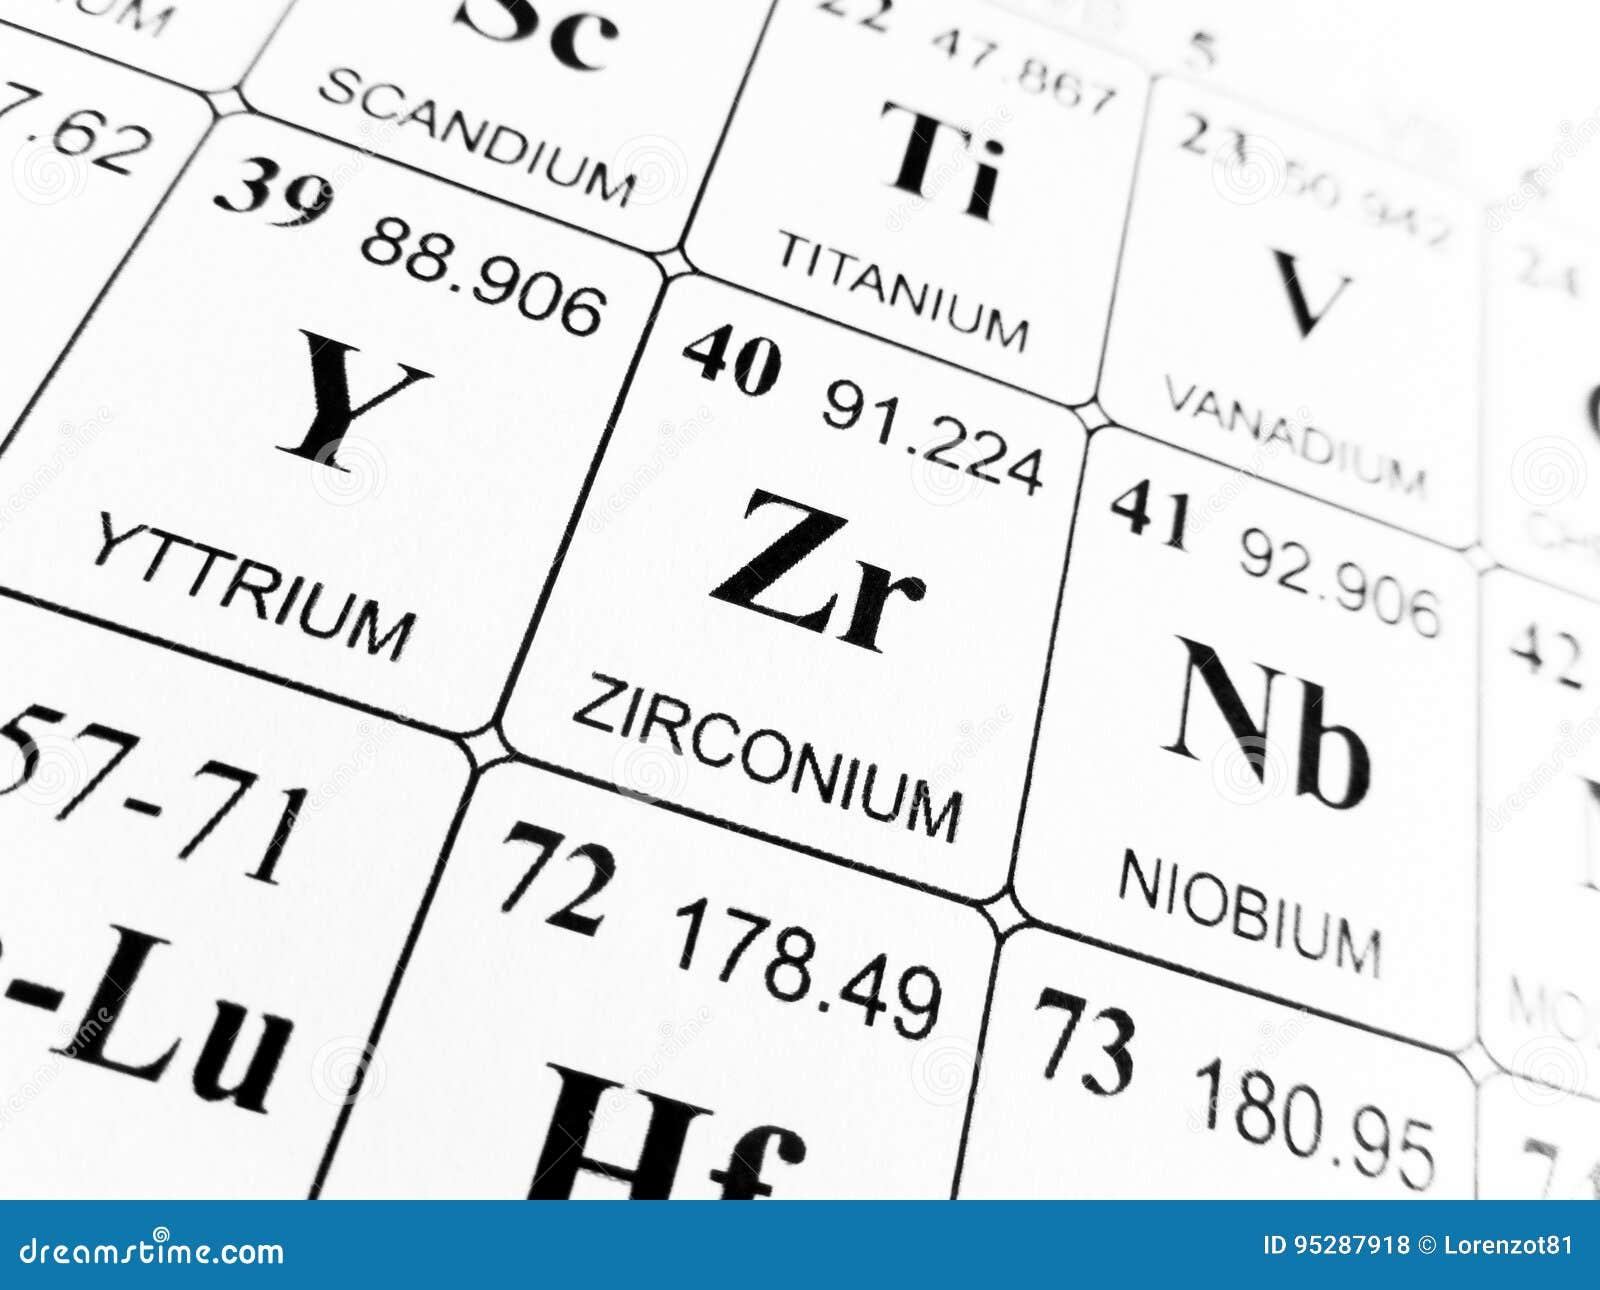 Zirconium on the periodic table of the elements stock photo image zirconium on the periodic table of the elements urtaz Gallery